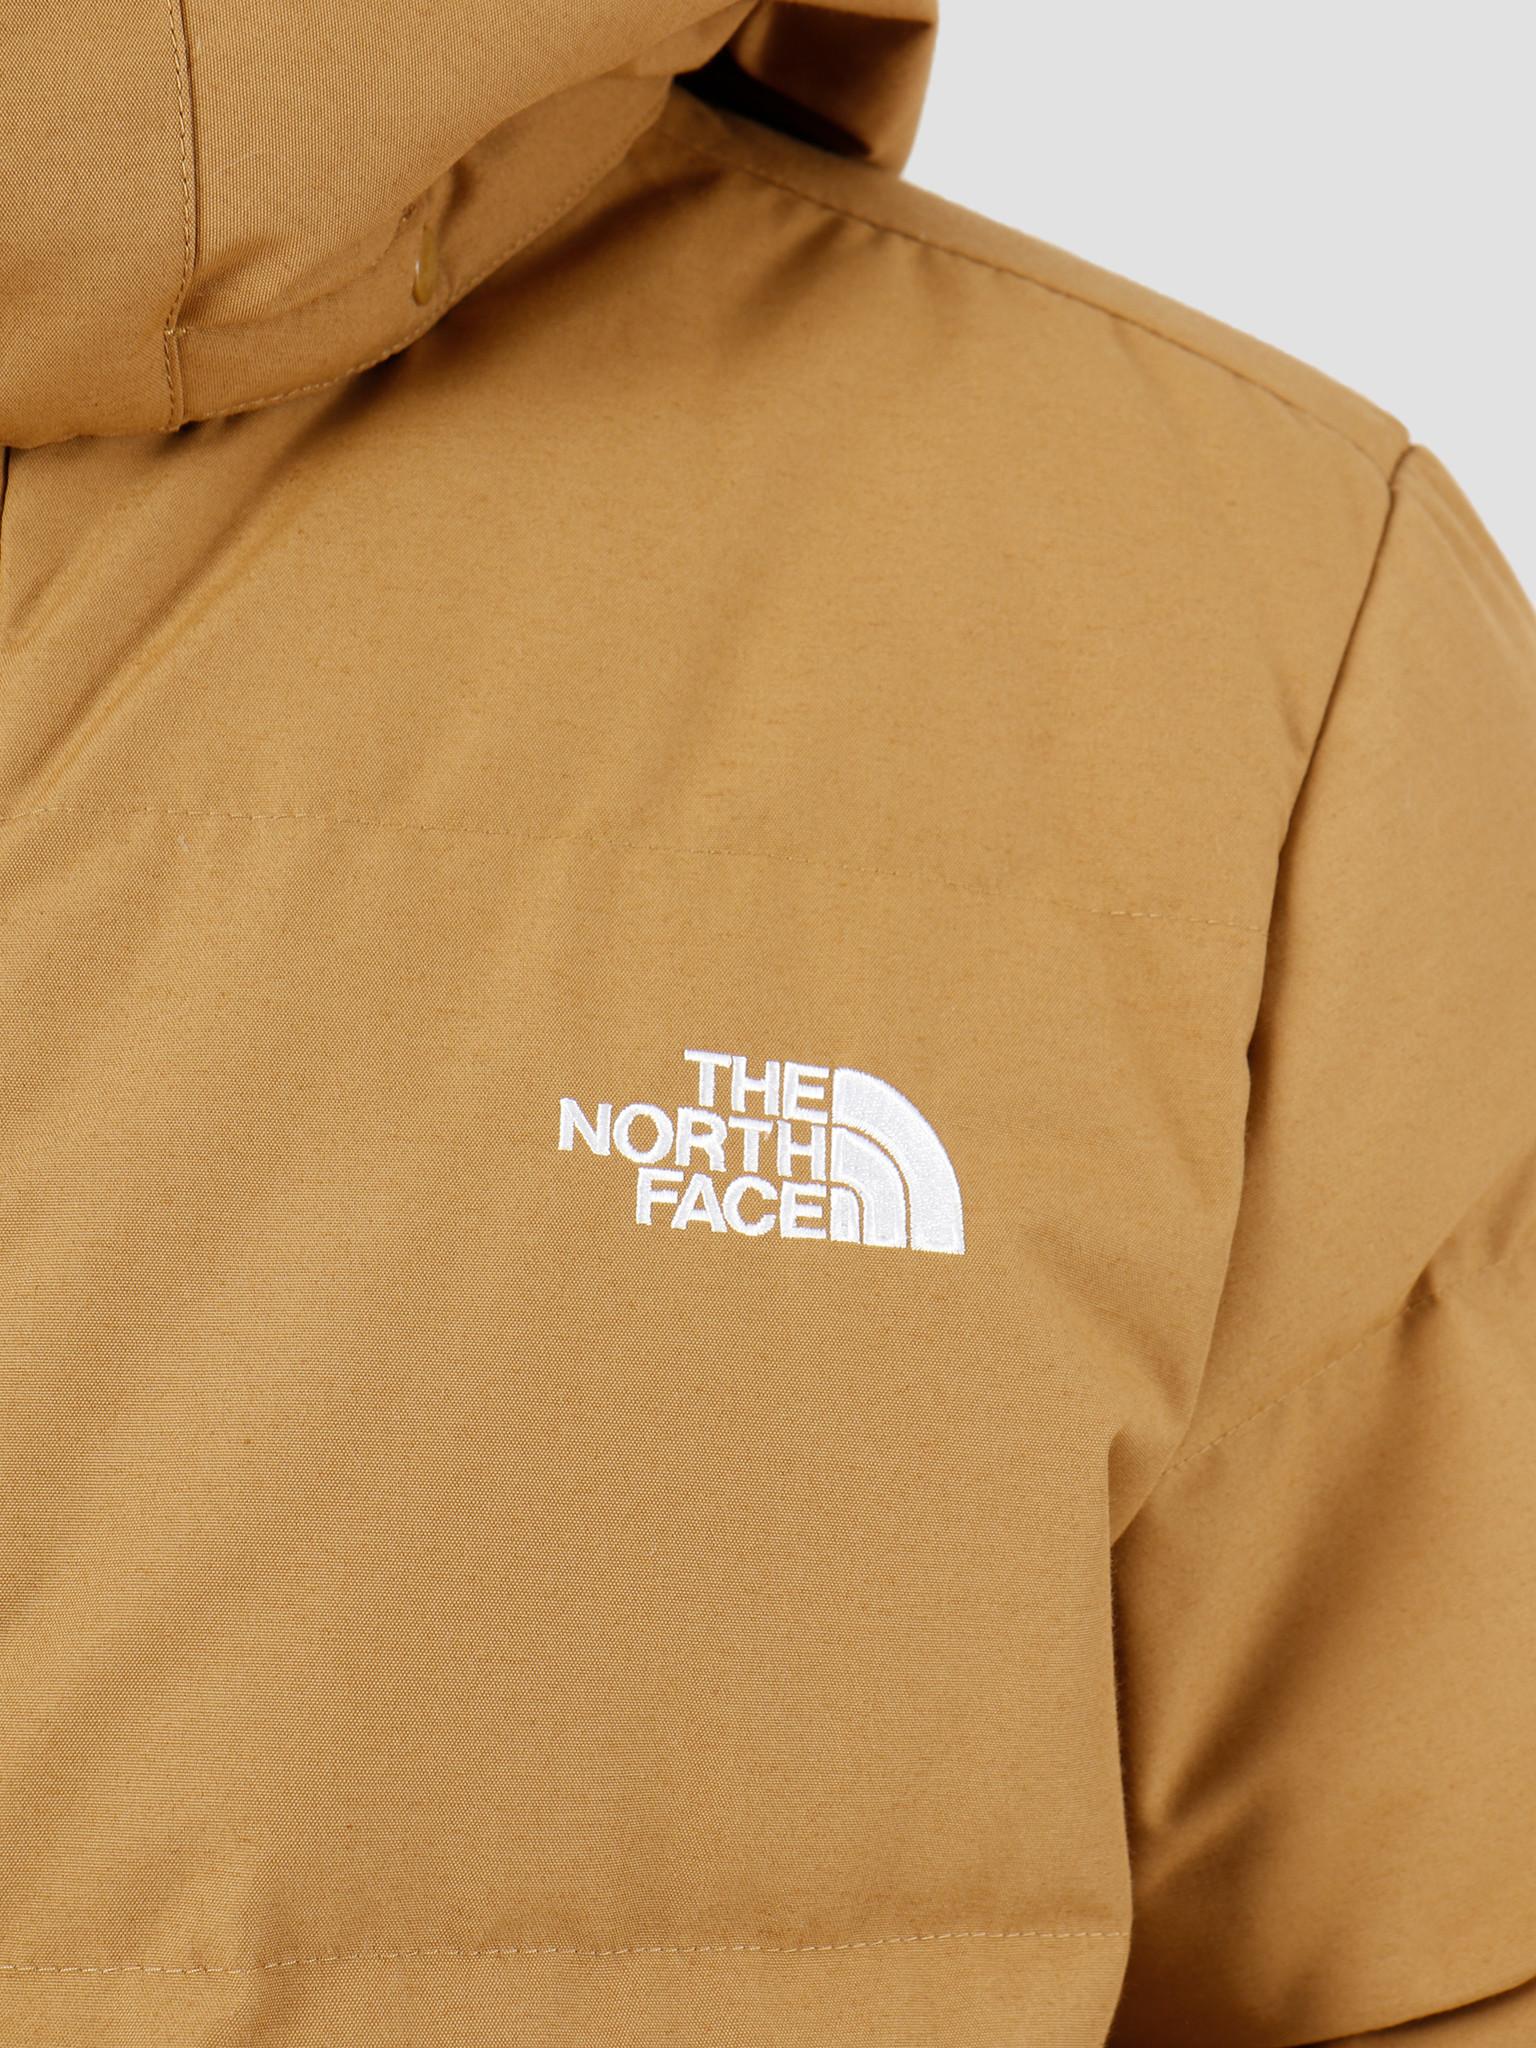 The North Face The North Face Box Canyon Jacket British Khaki T93Y25D9V